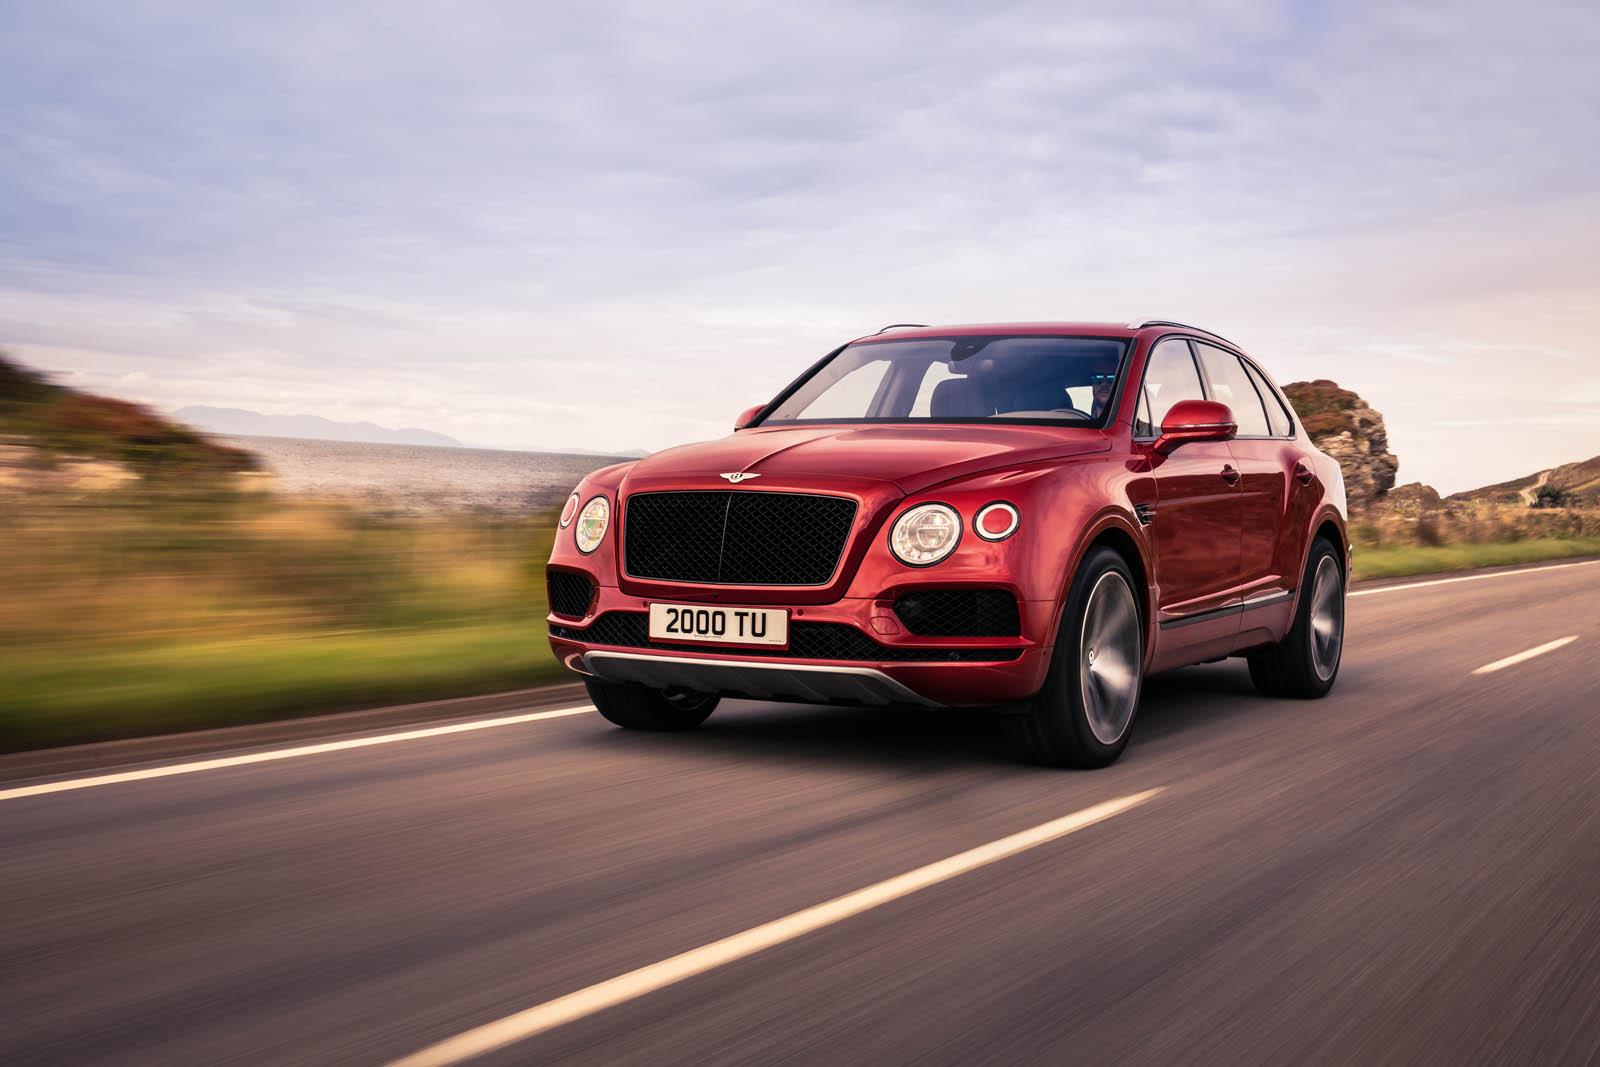 Bentley Bentayga V8 Pricing For South Africa